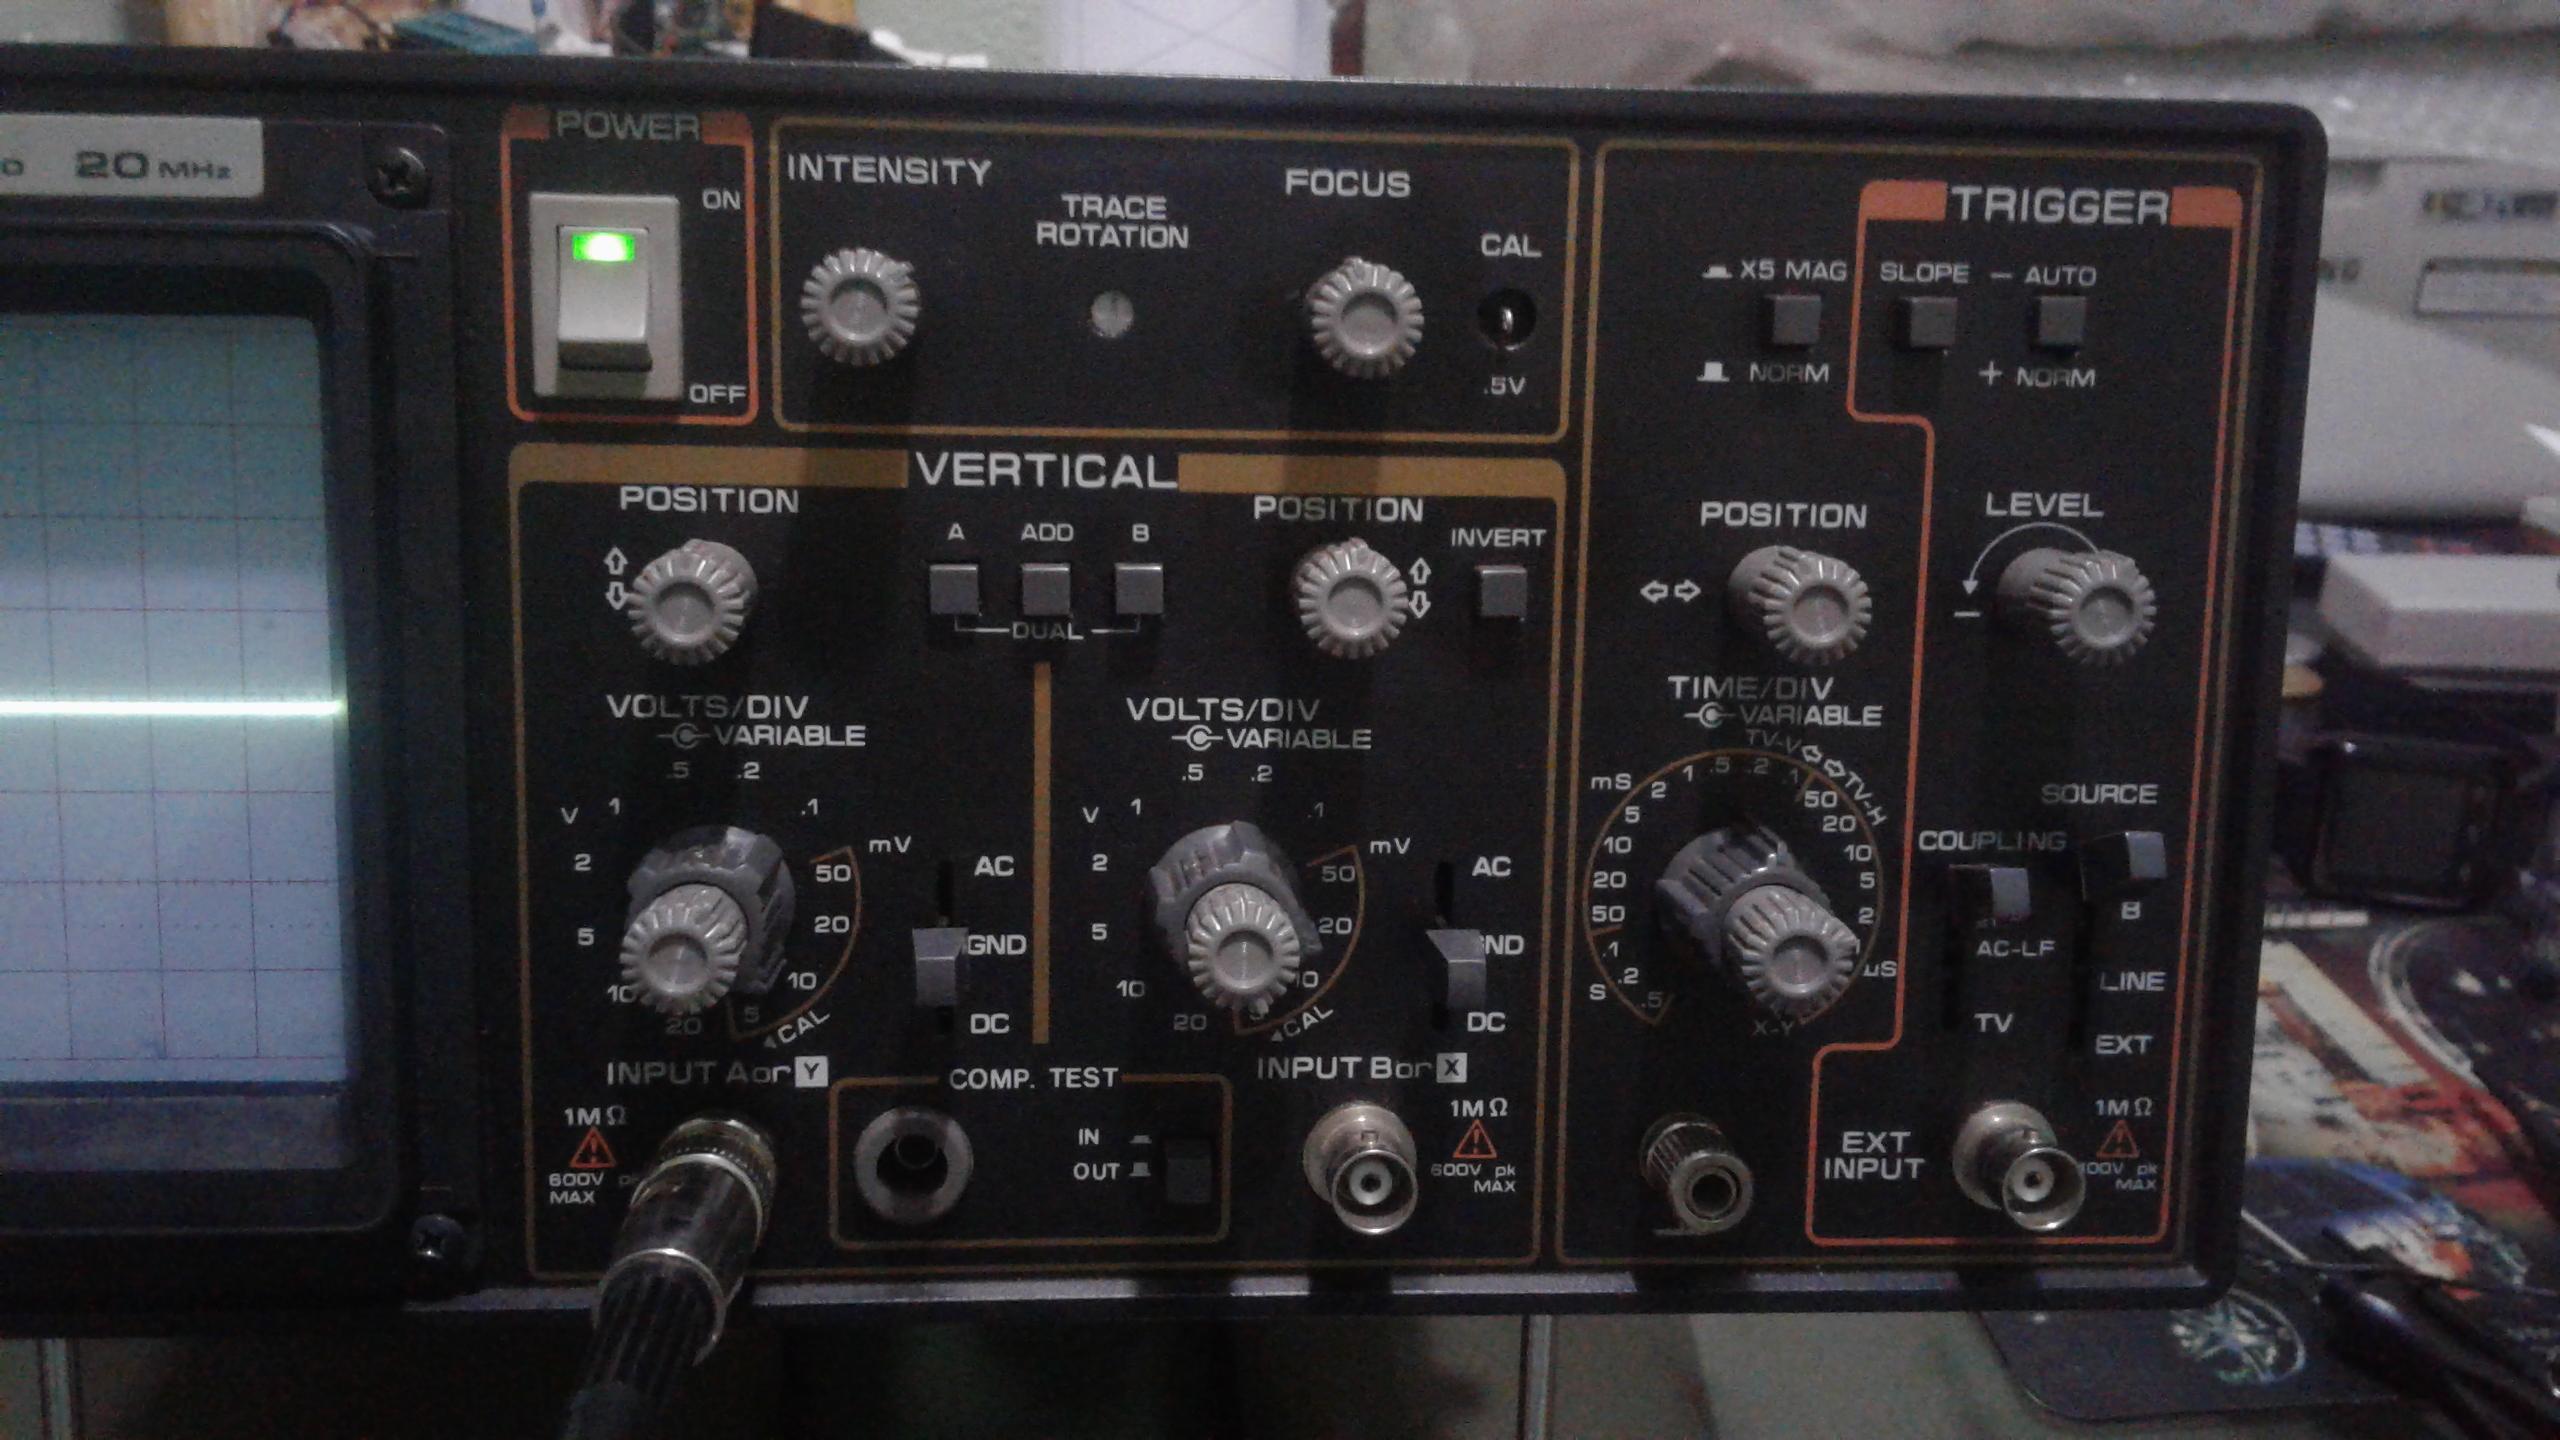 Mini-UFO Explorer 2 4GHz 4-AXIS DRONE w/Camera and WIFI (Mode 2)